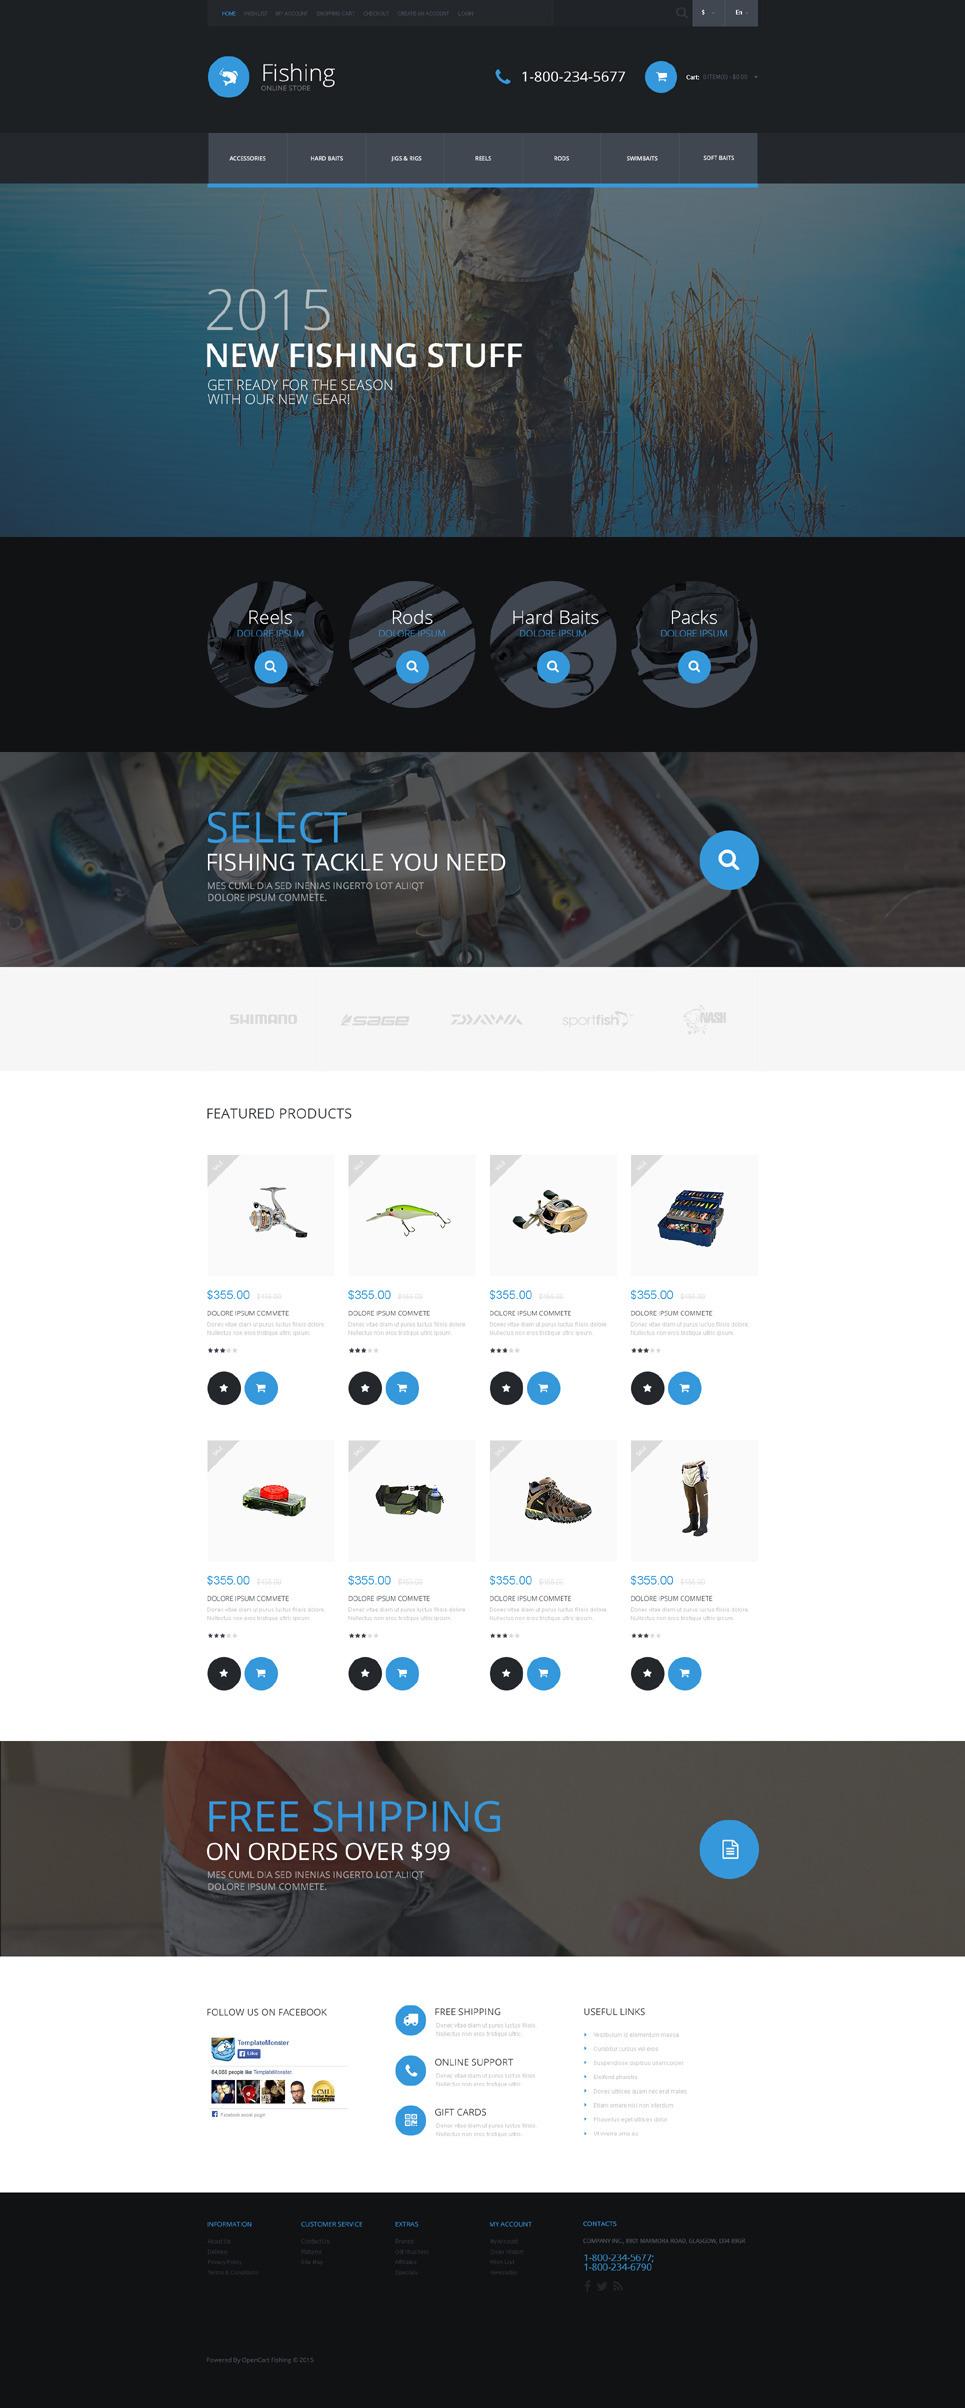 Fishing Equipment Store OpenCart Template New Screenshots BIG